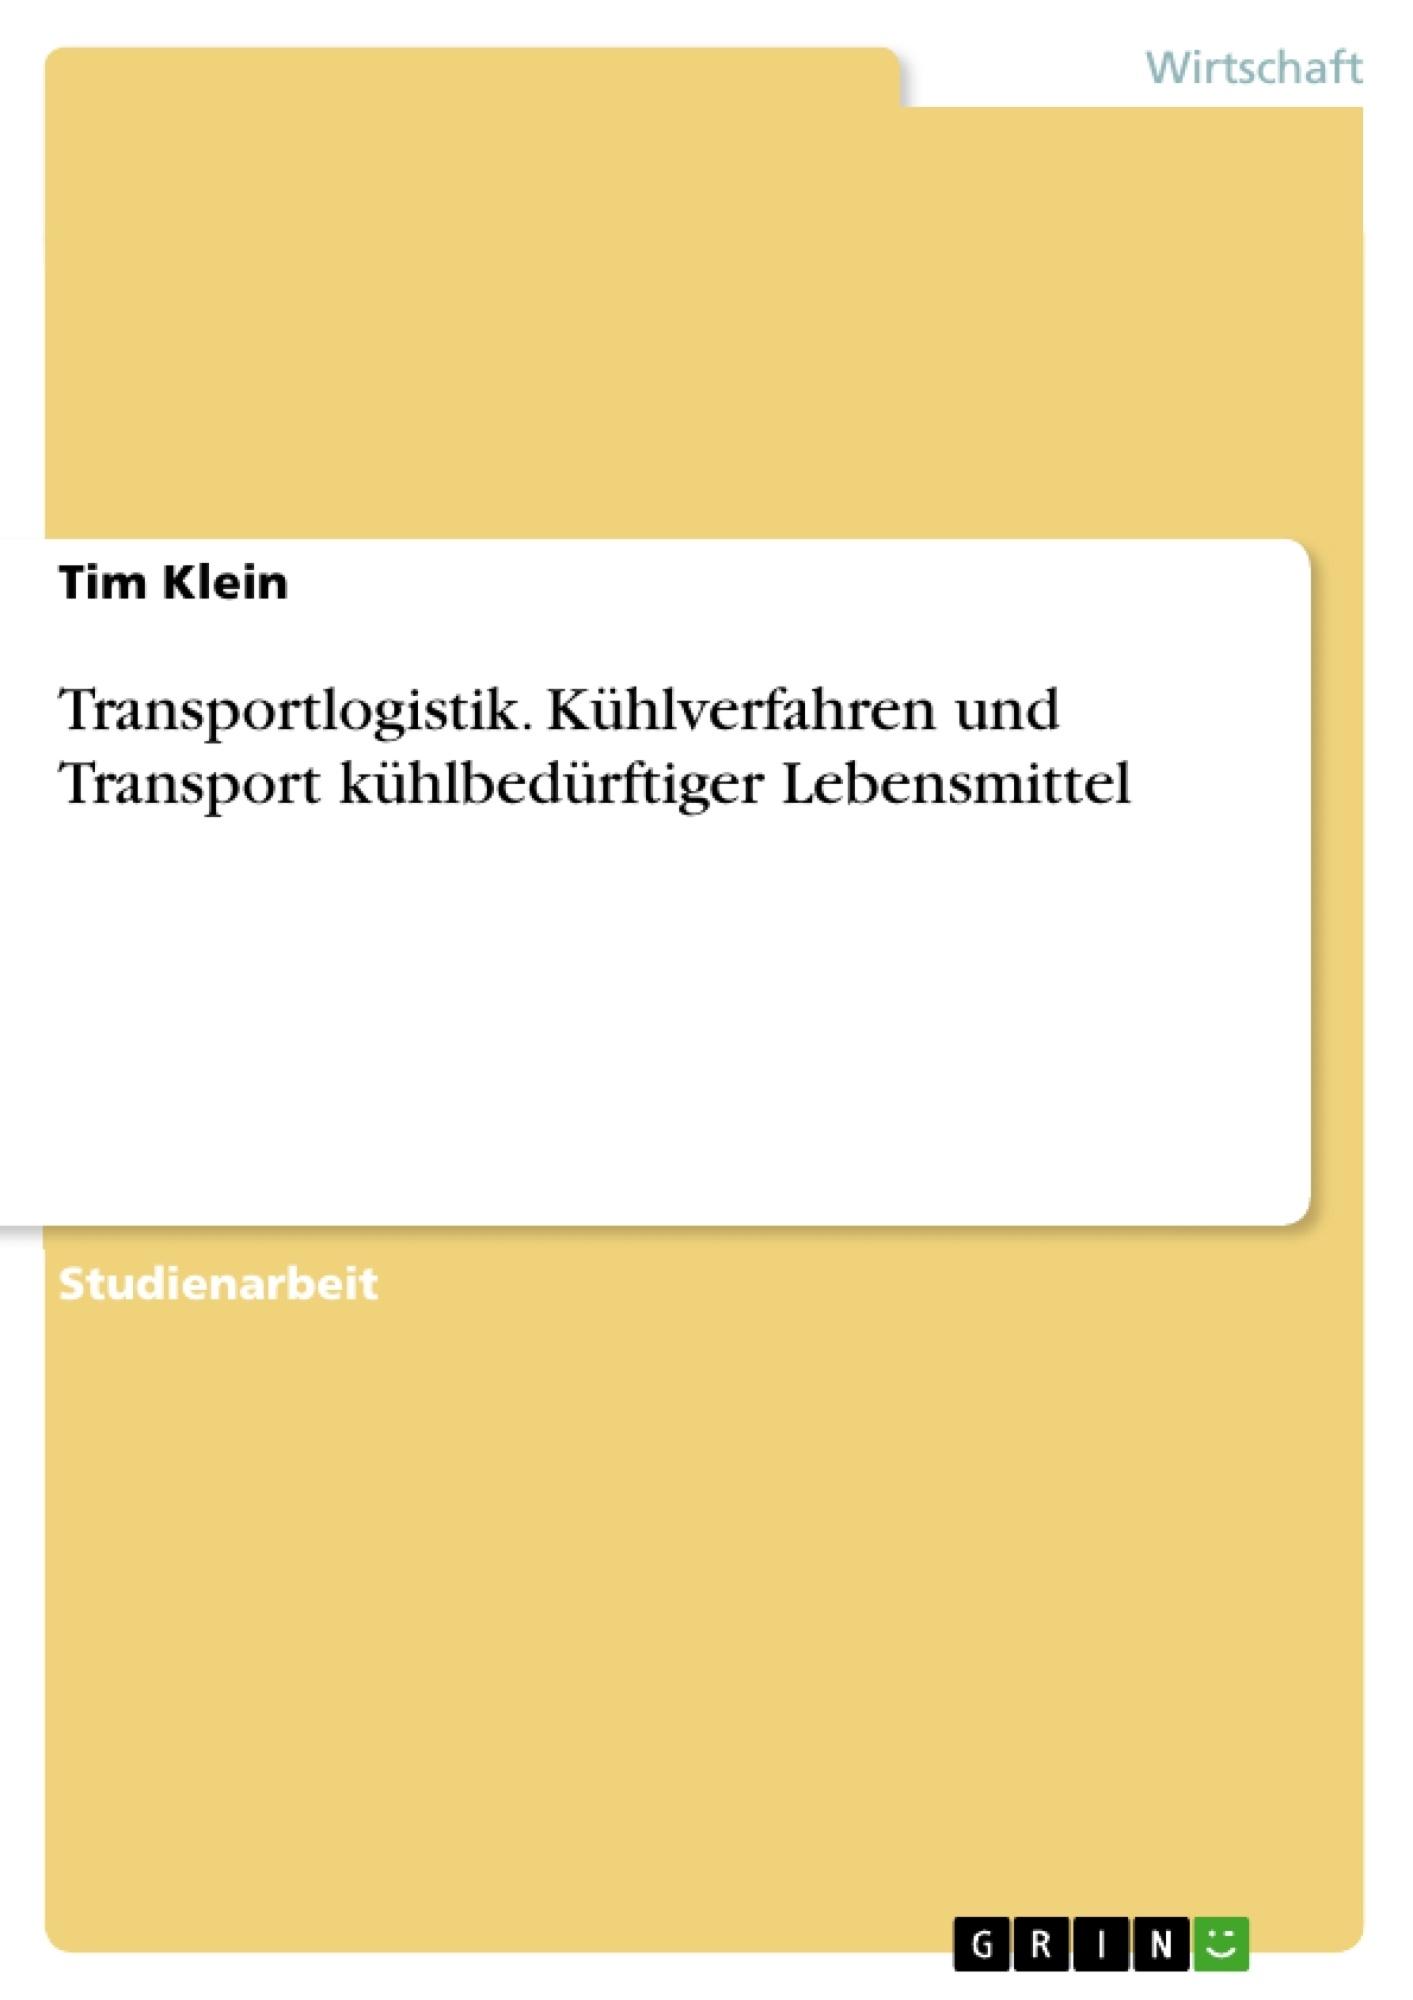 Titel: Transportlogistik. Kühlverfahren und Transport kühlbedürftiger Lebensmittel